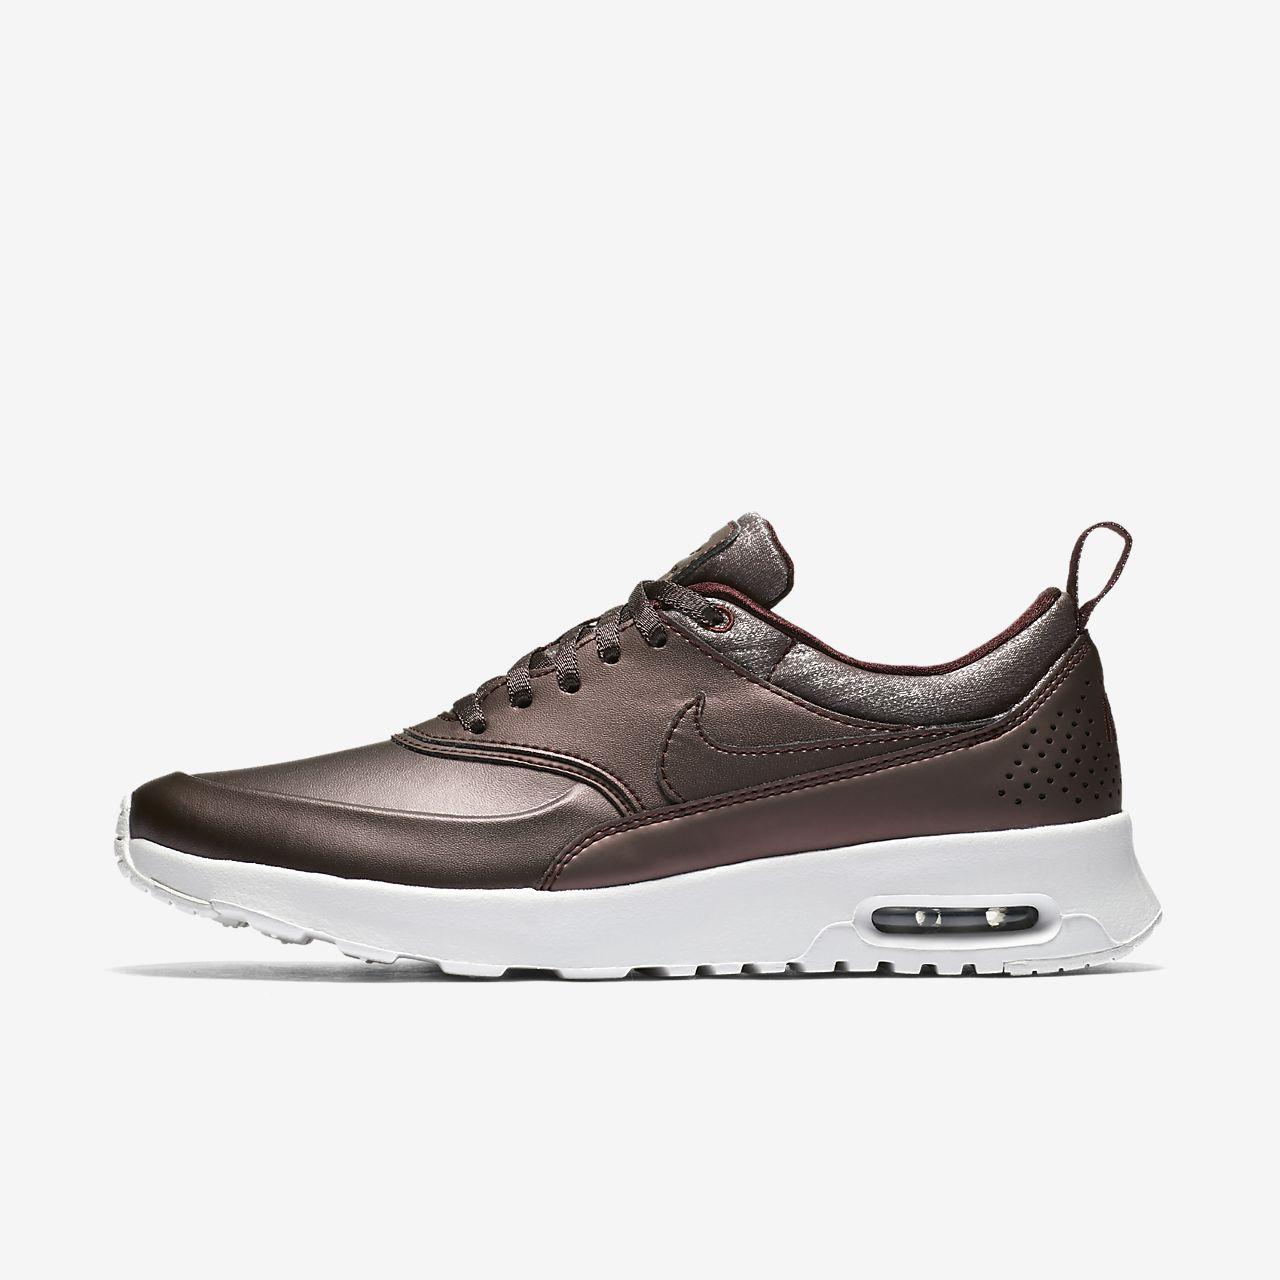 Nike Air Max Thea Ultra - Damen Schuhe Black Größe 39 03nkln